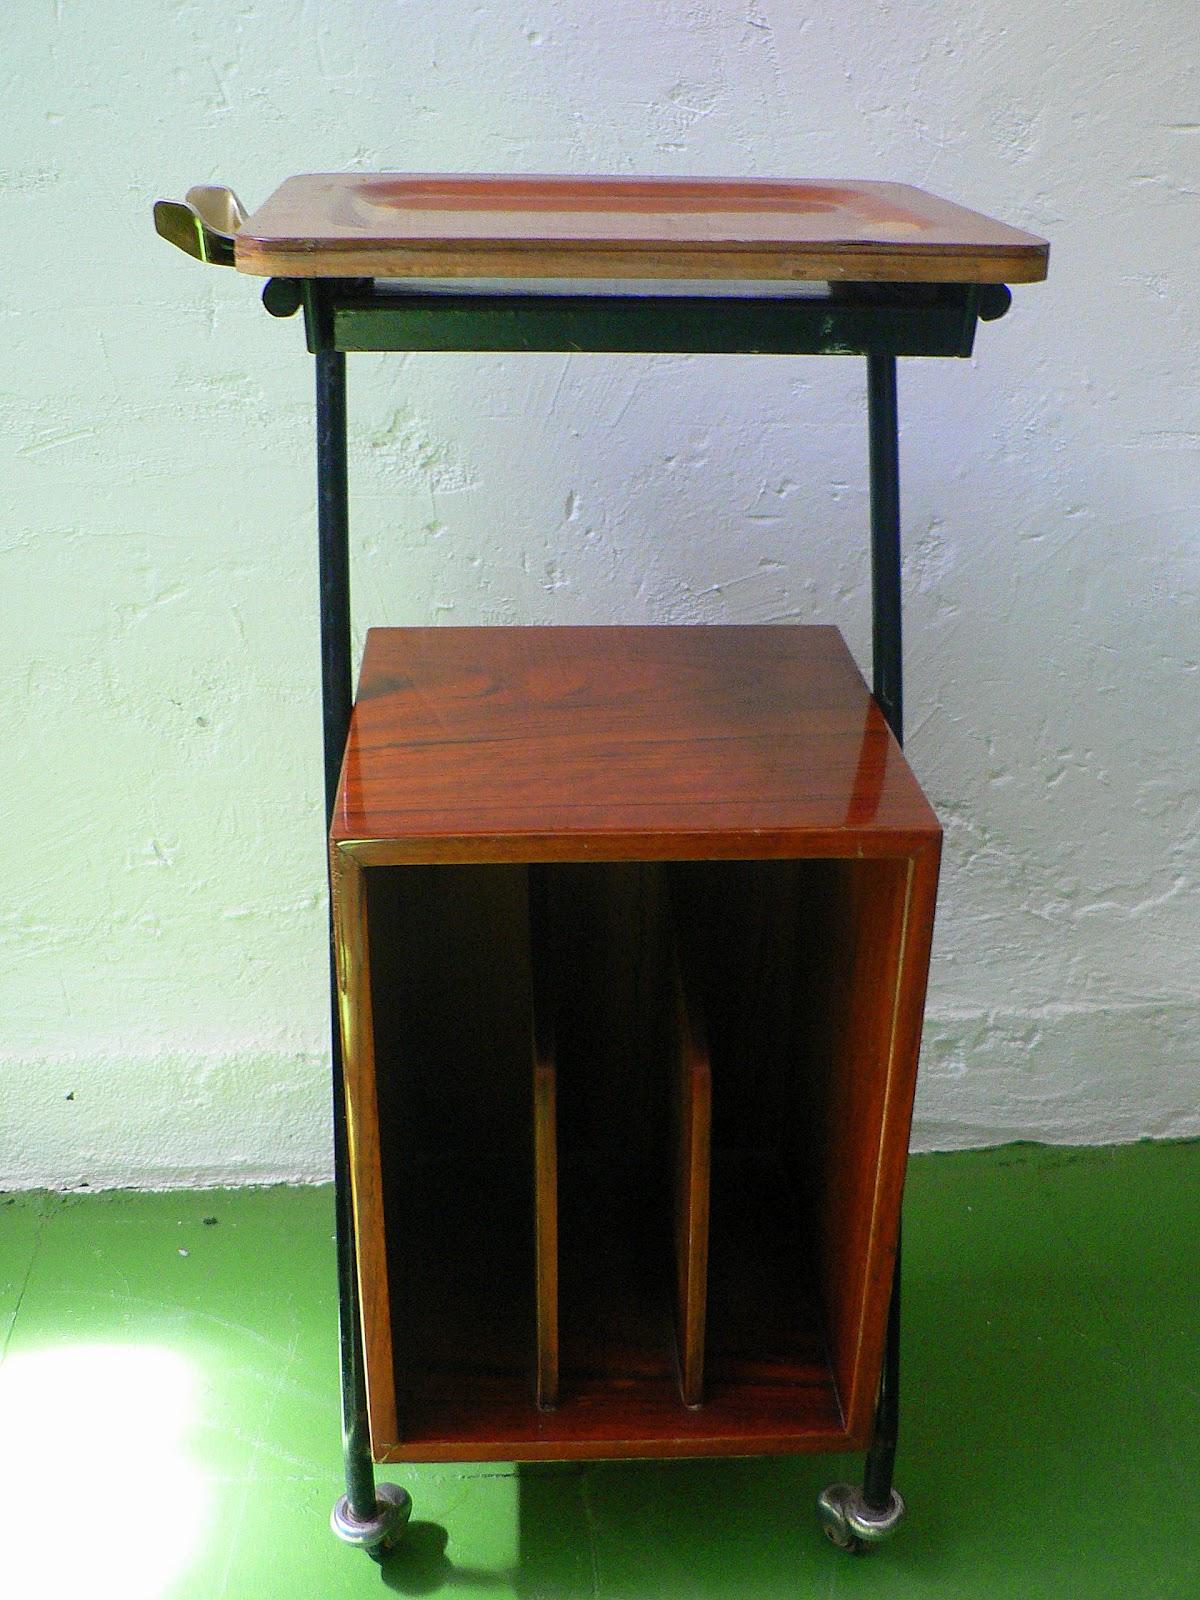 Vintage kitsch siglo xx mesa telefonera auxiliar a os 50 60 for Mesa telefonera